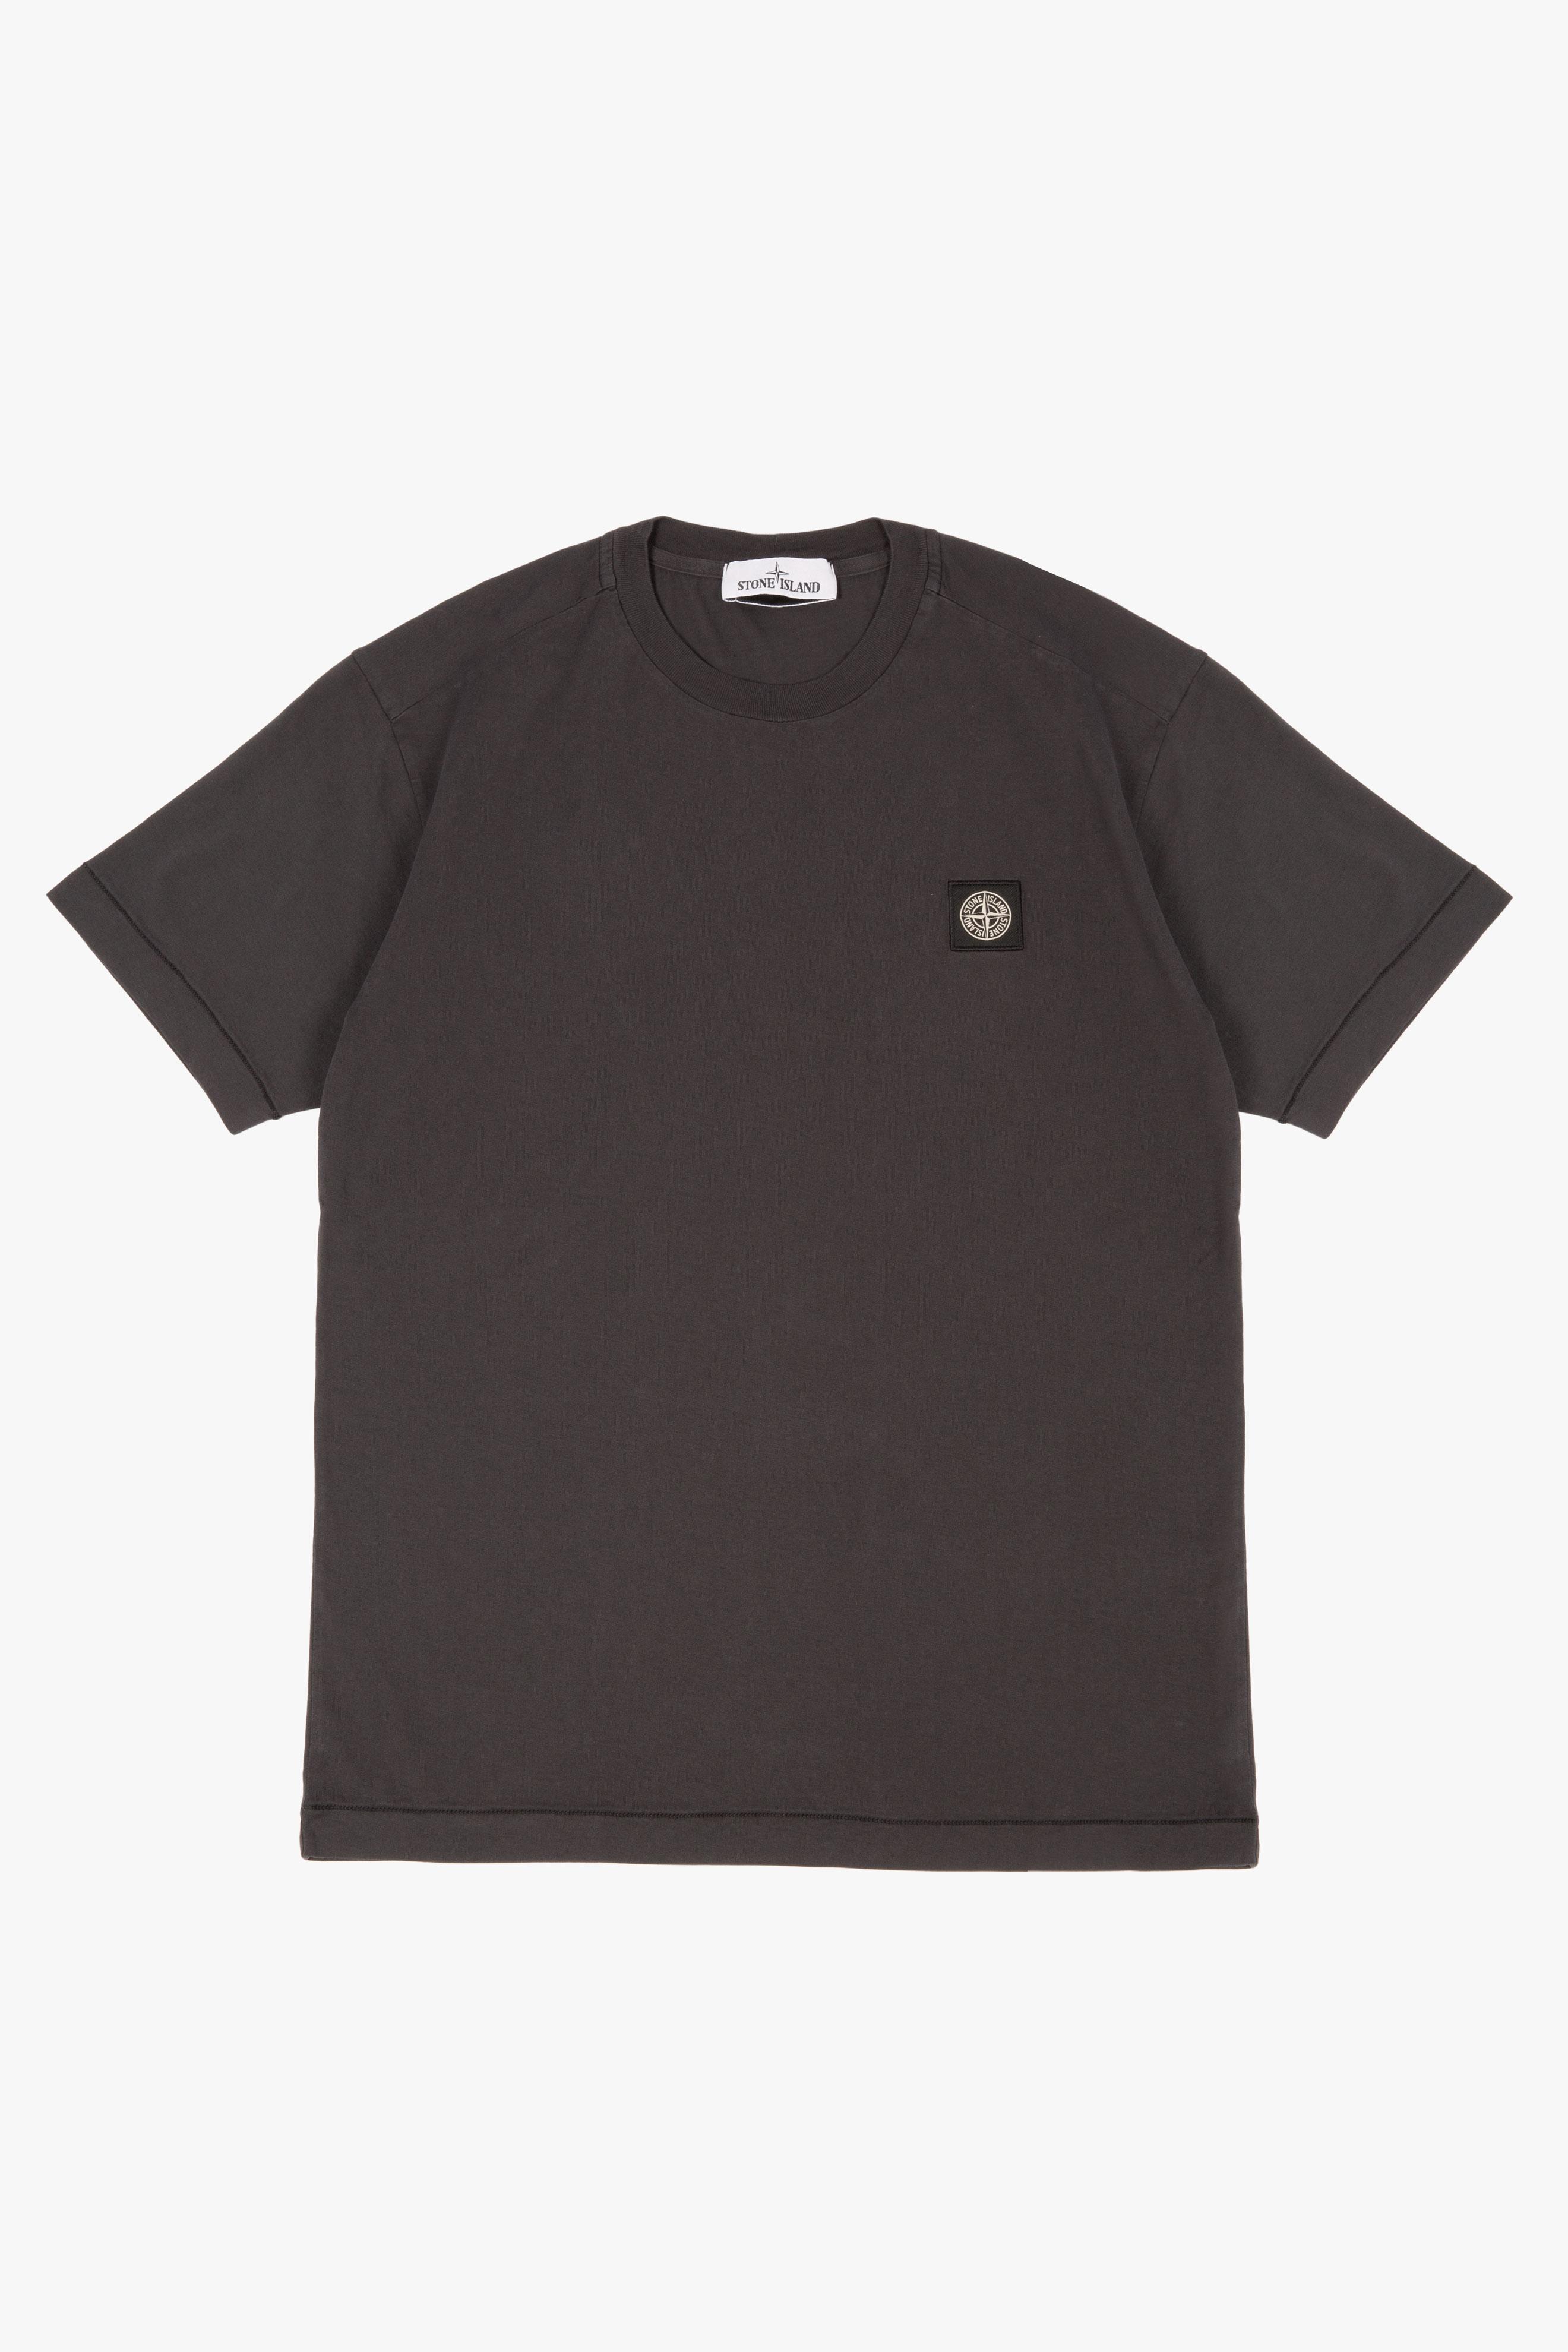 T-Shirt Anthracite